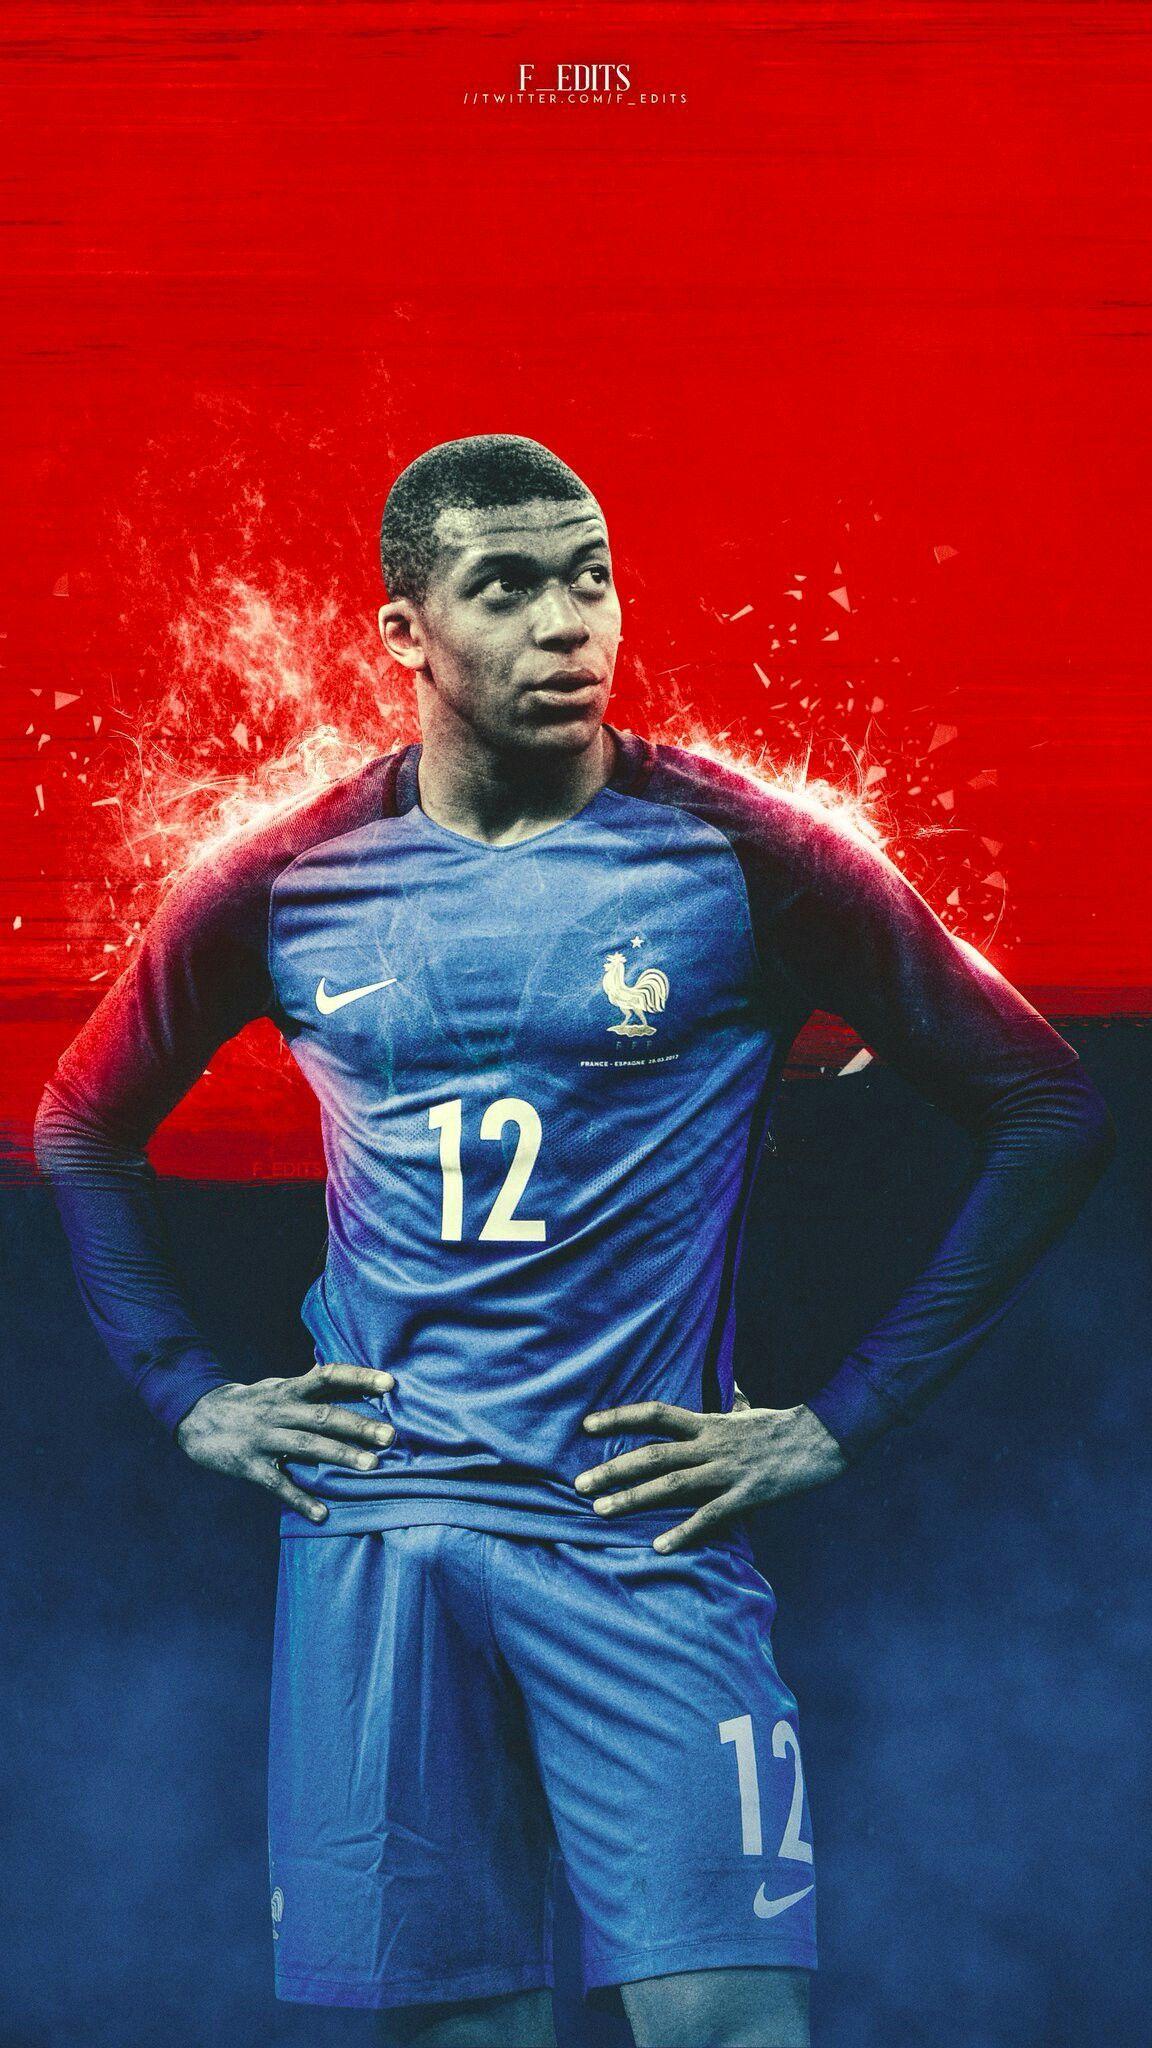 Kylian Mbappé France | Affiche de football | Pinterest | France …